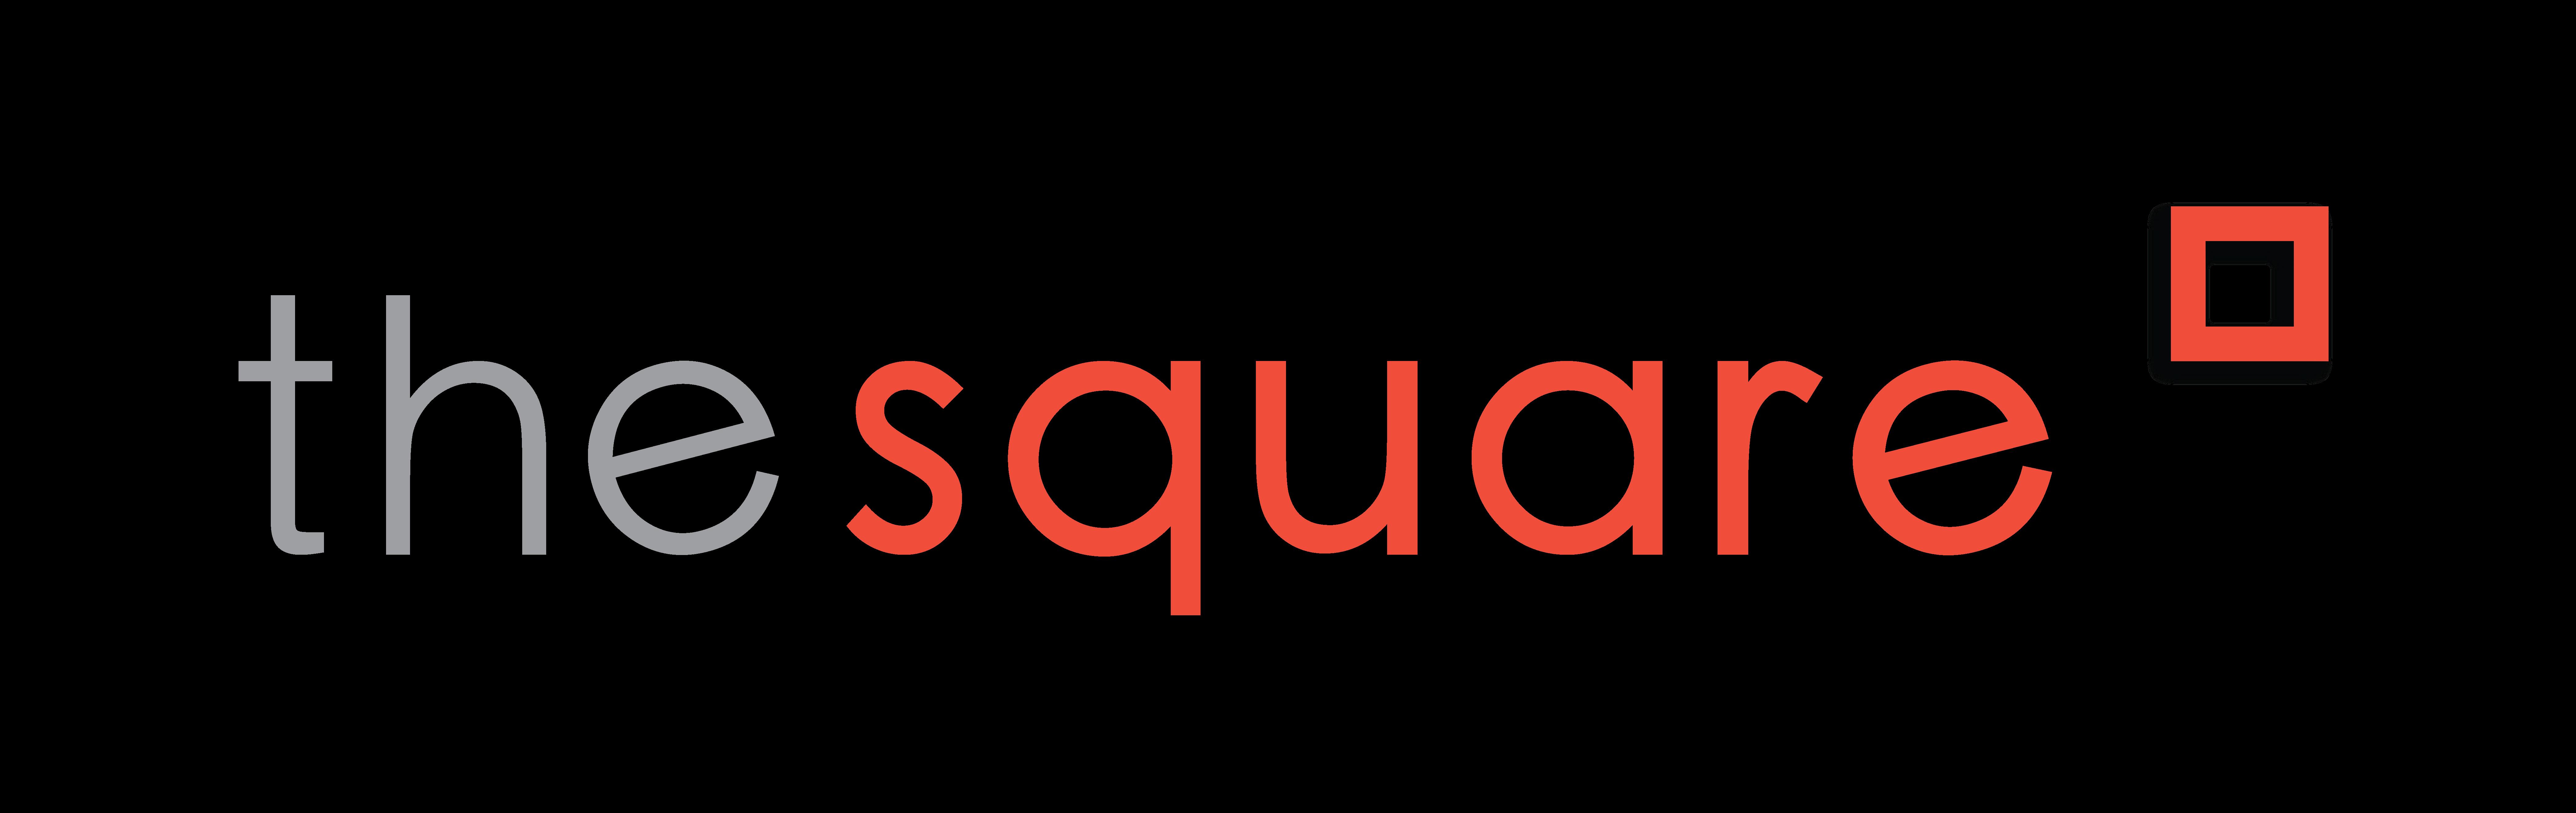 The Square Tech